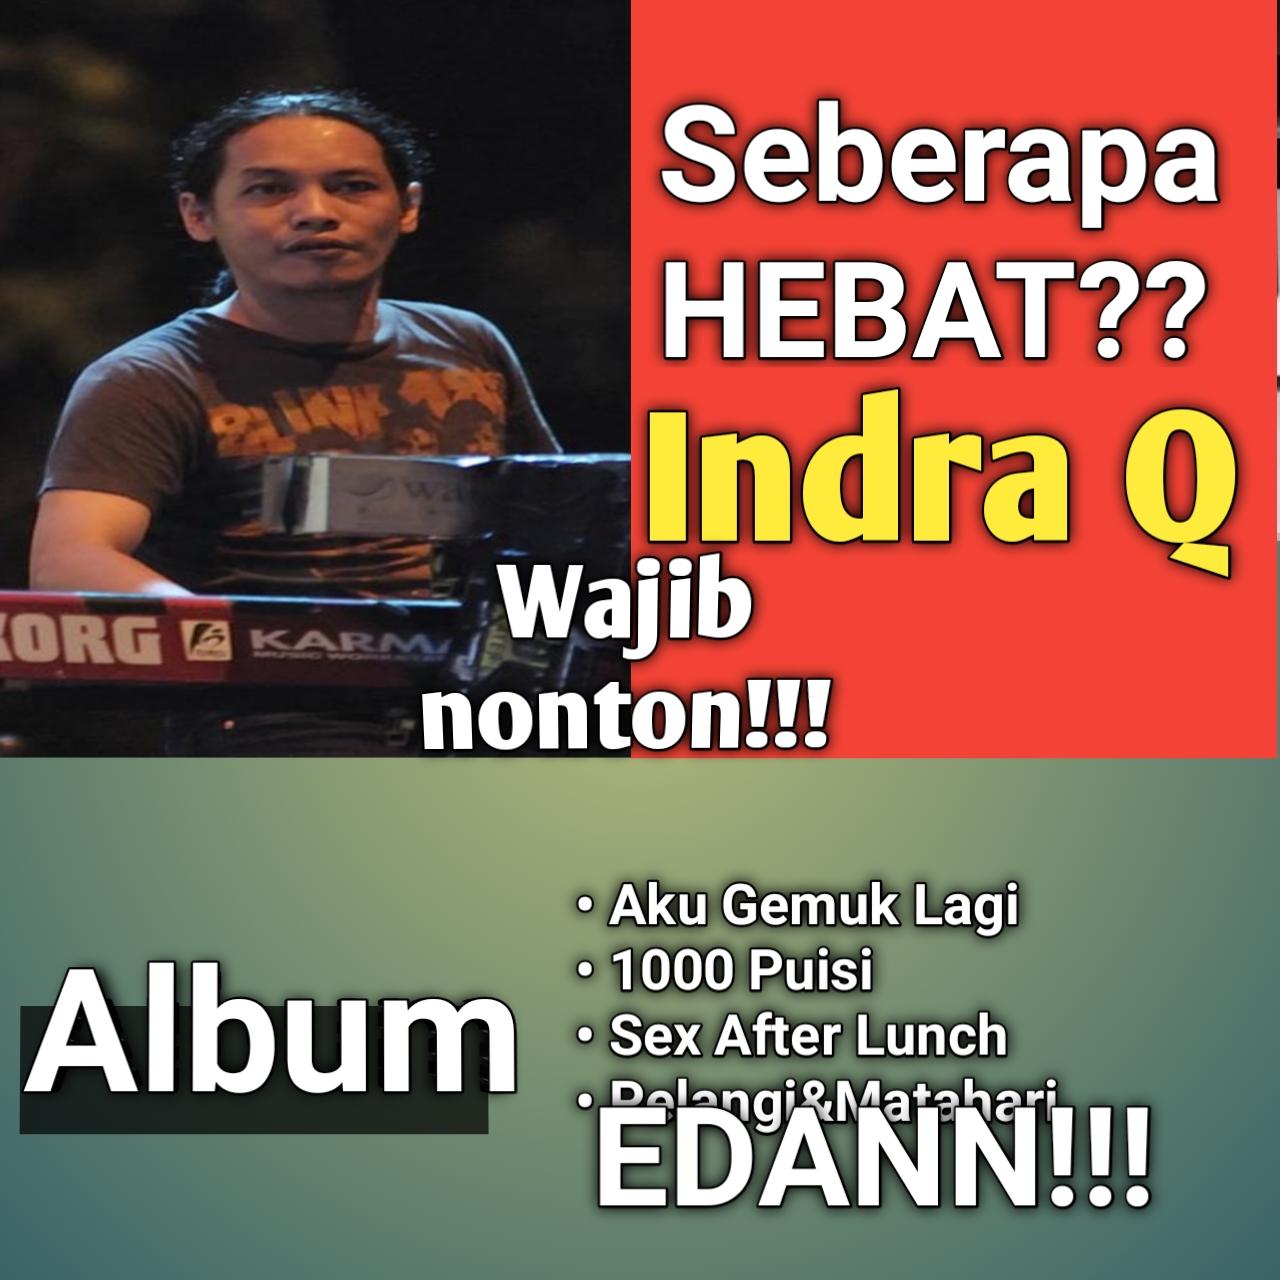 Yozar channel - SEBERAPA HEBAT INDRA Q?!?!?!